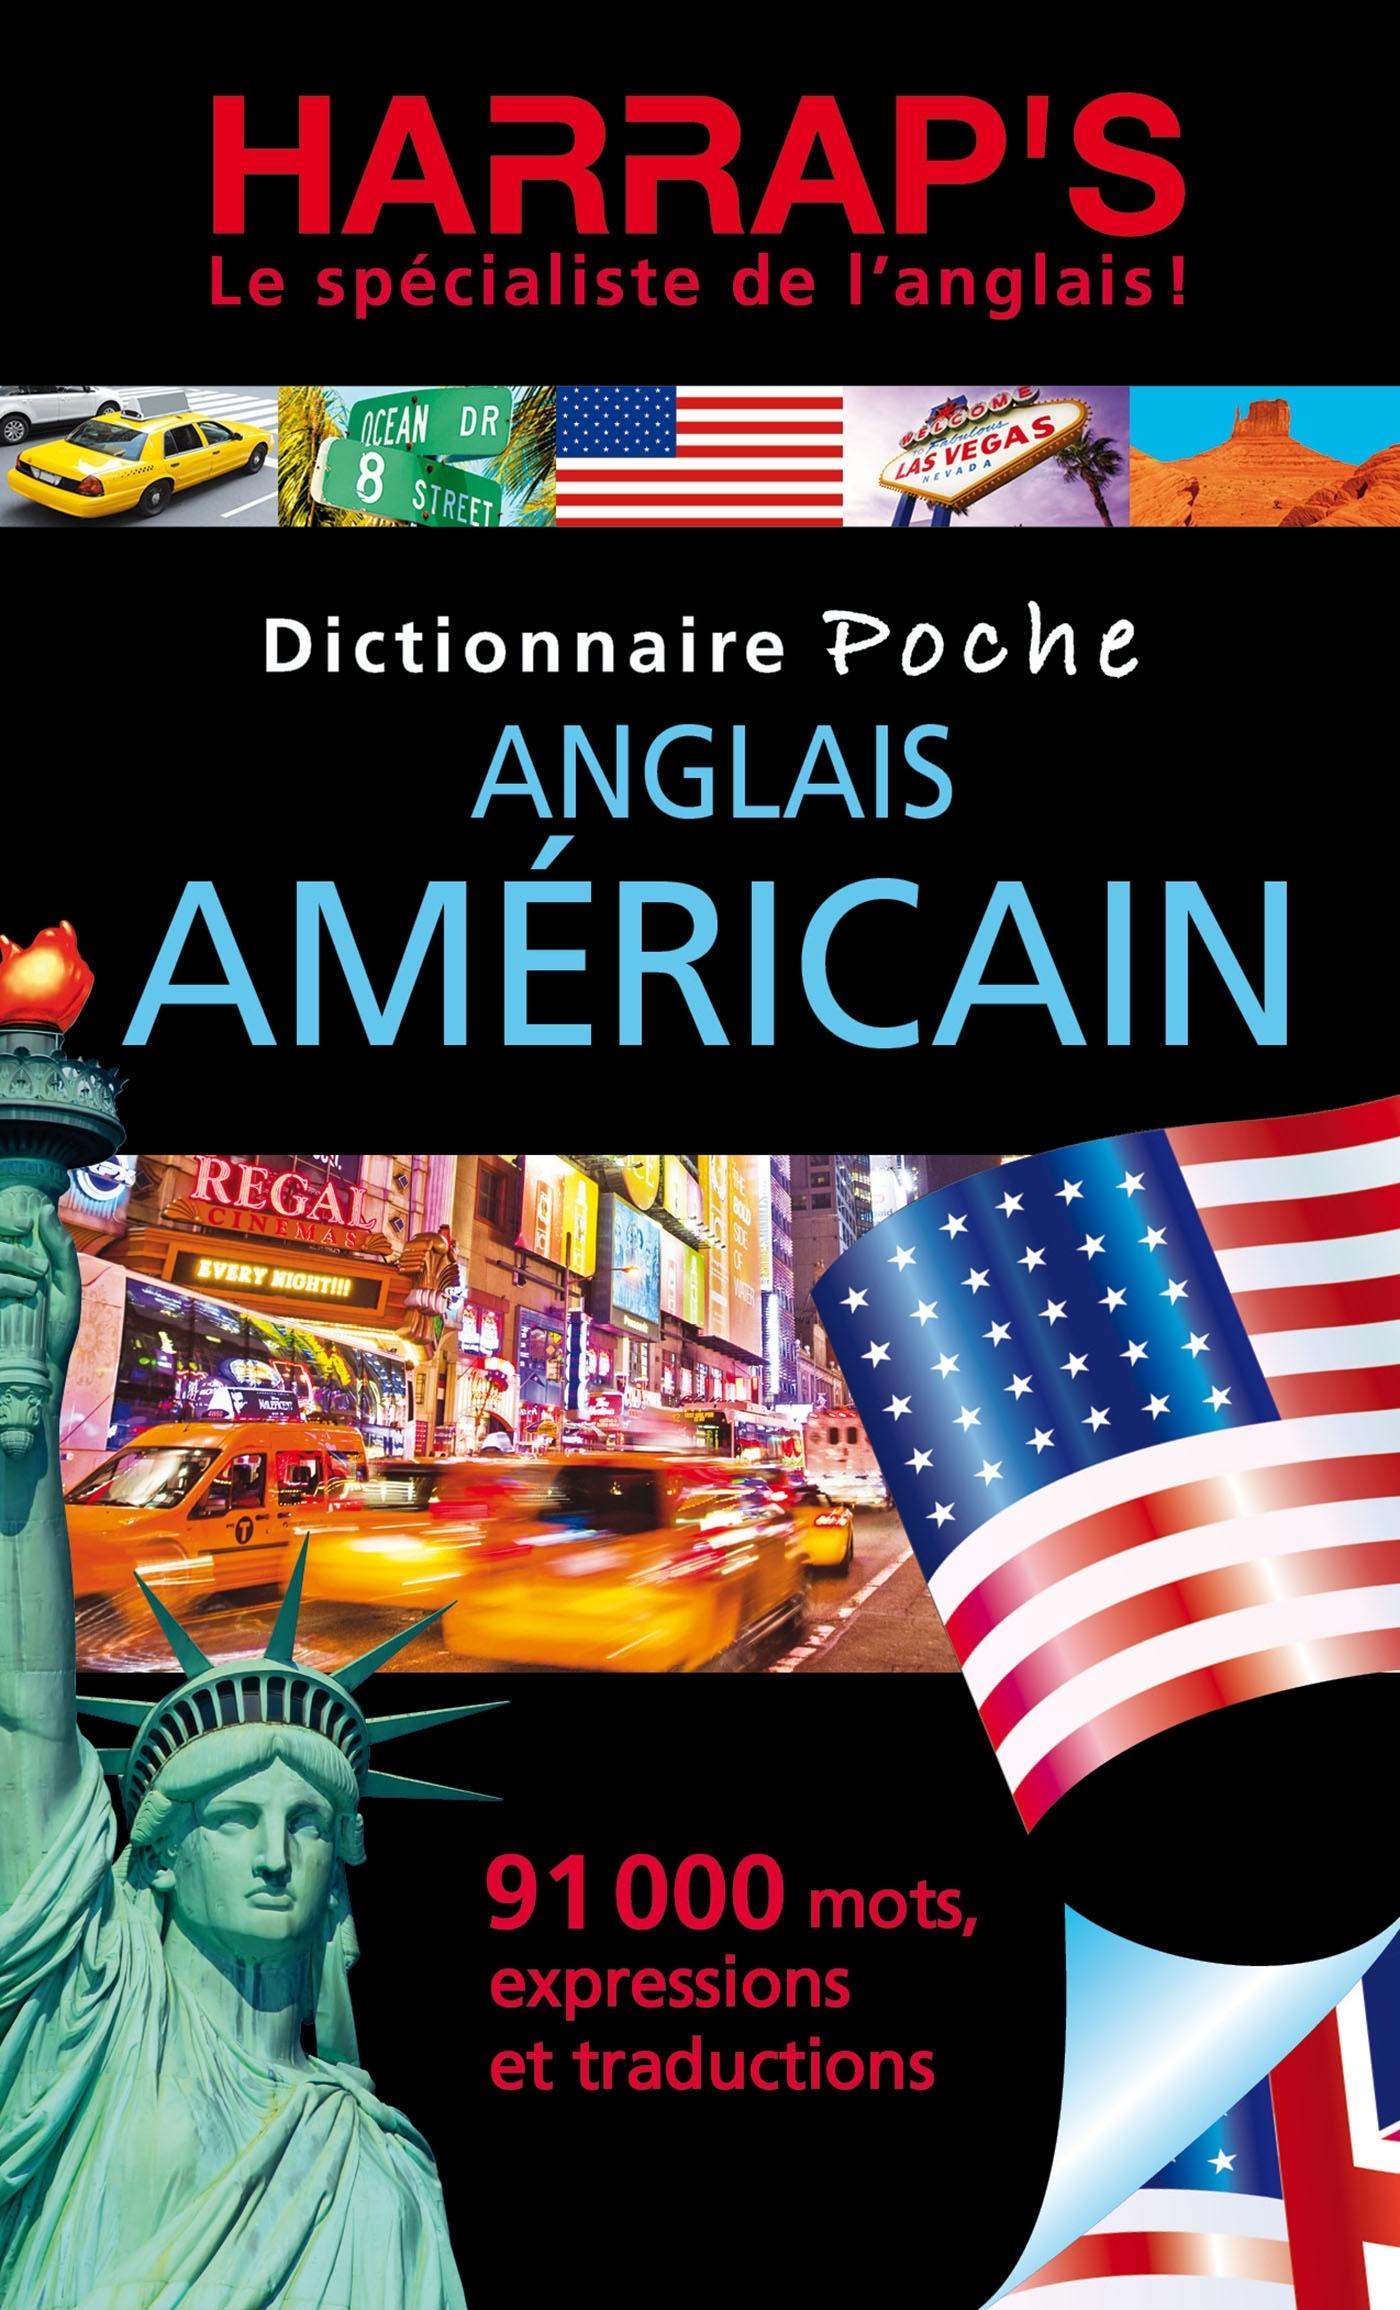 HARRAP'S POCHE ANGLAIS AMERICAIN